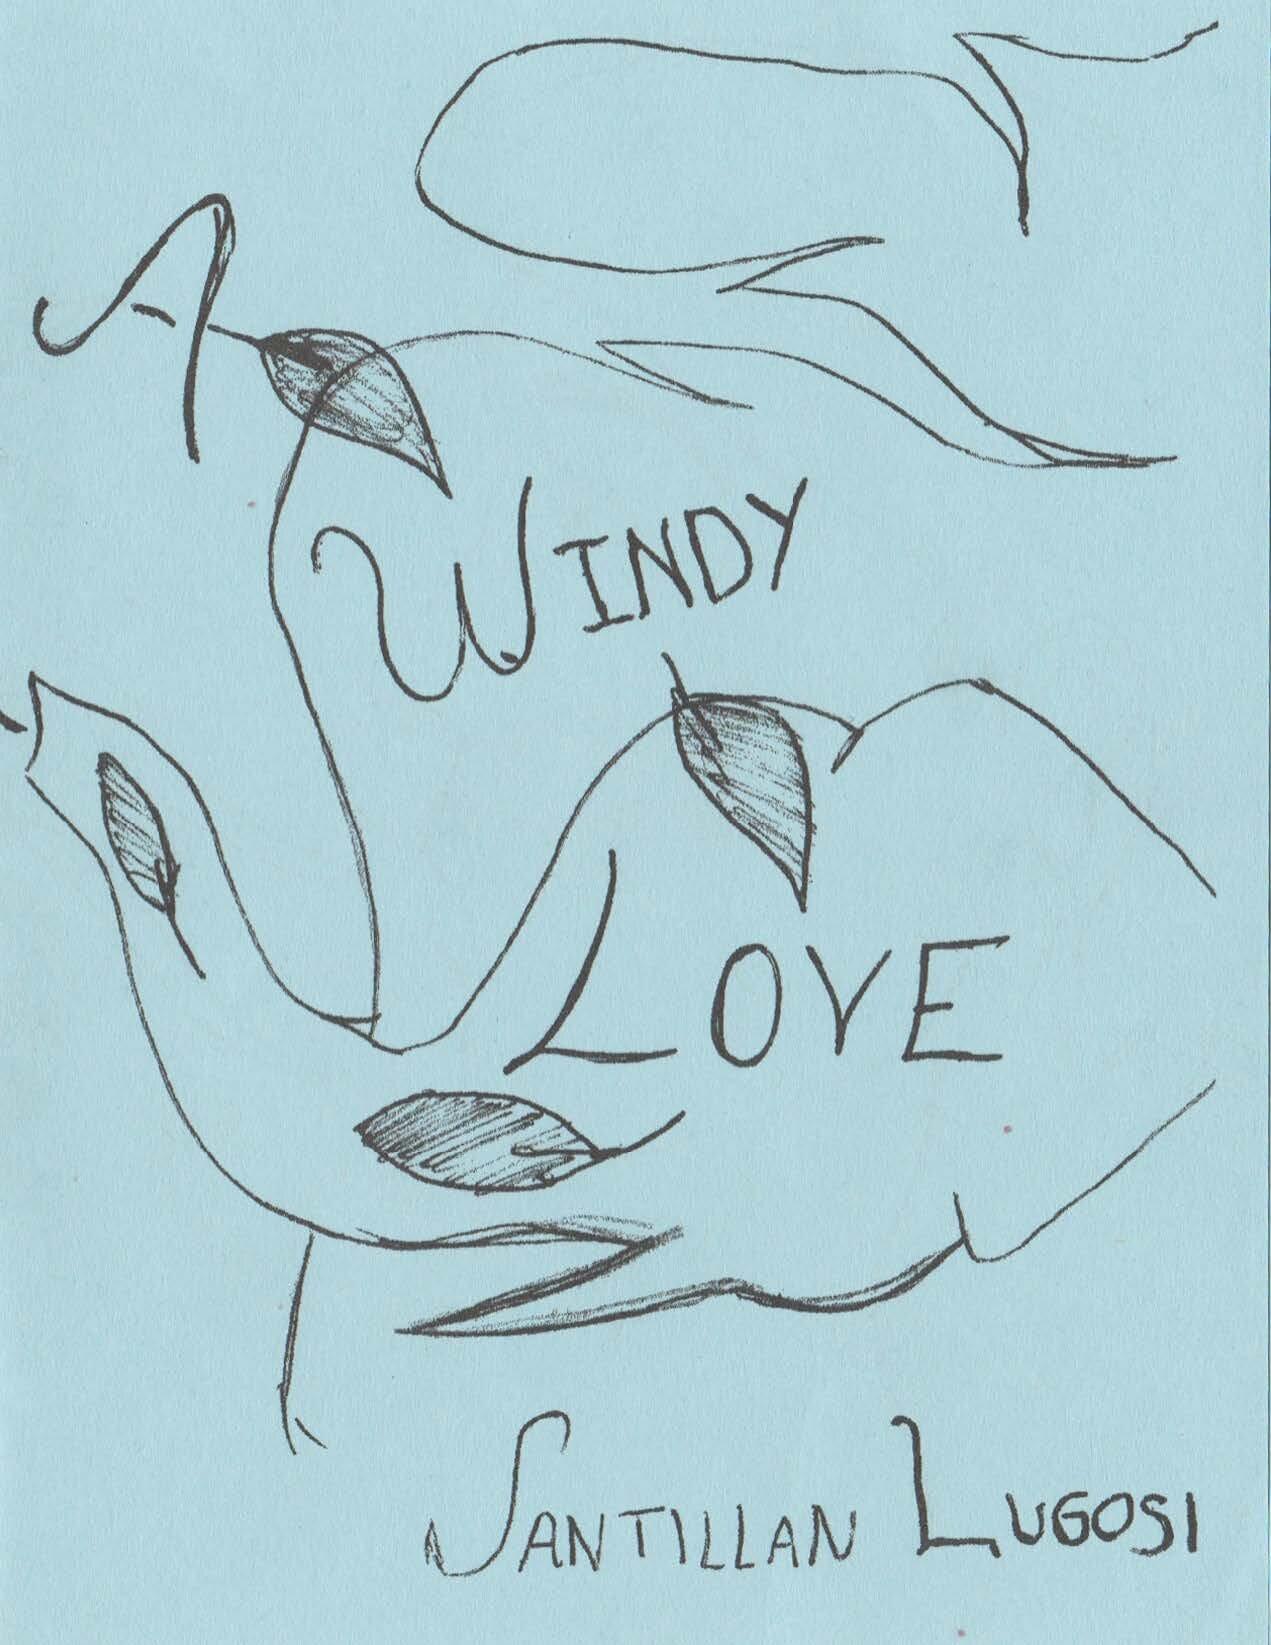 Windy Love_Page_1_Image_0001.jpg